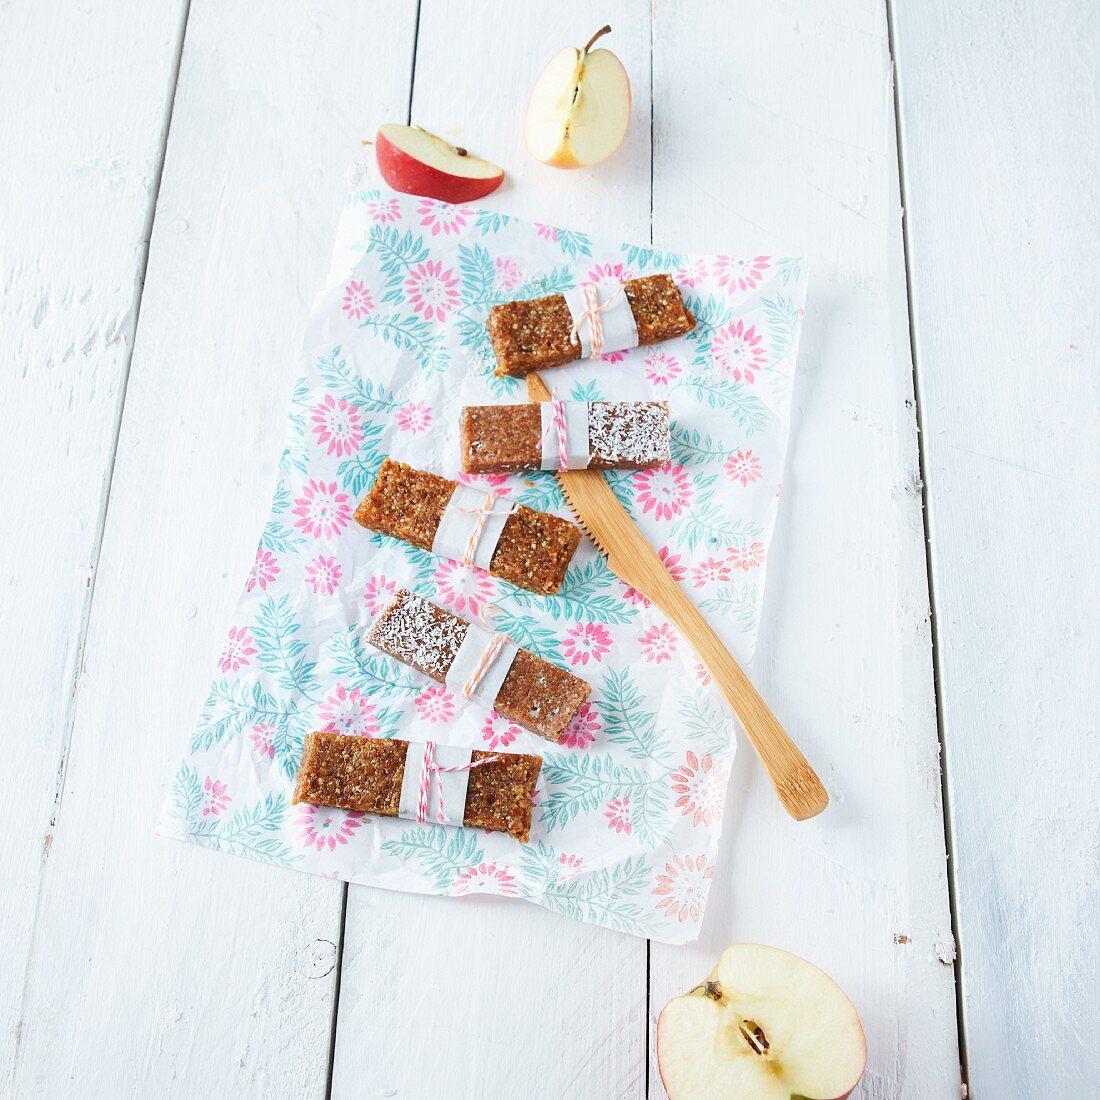 Kokos-Apfel-Riegel zum Mitnehmen